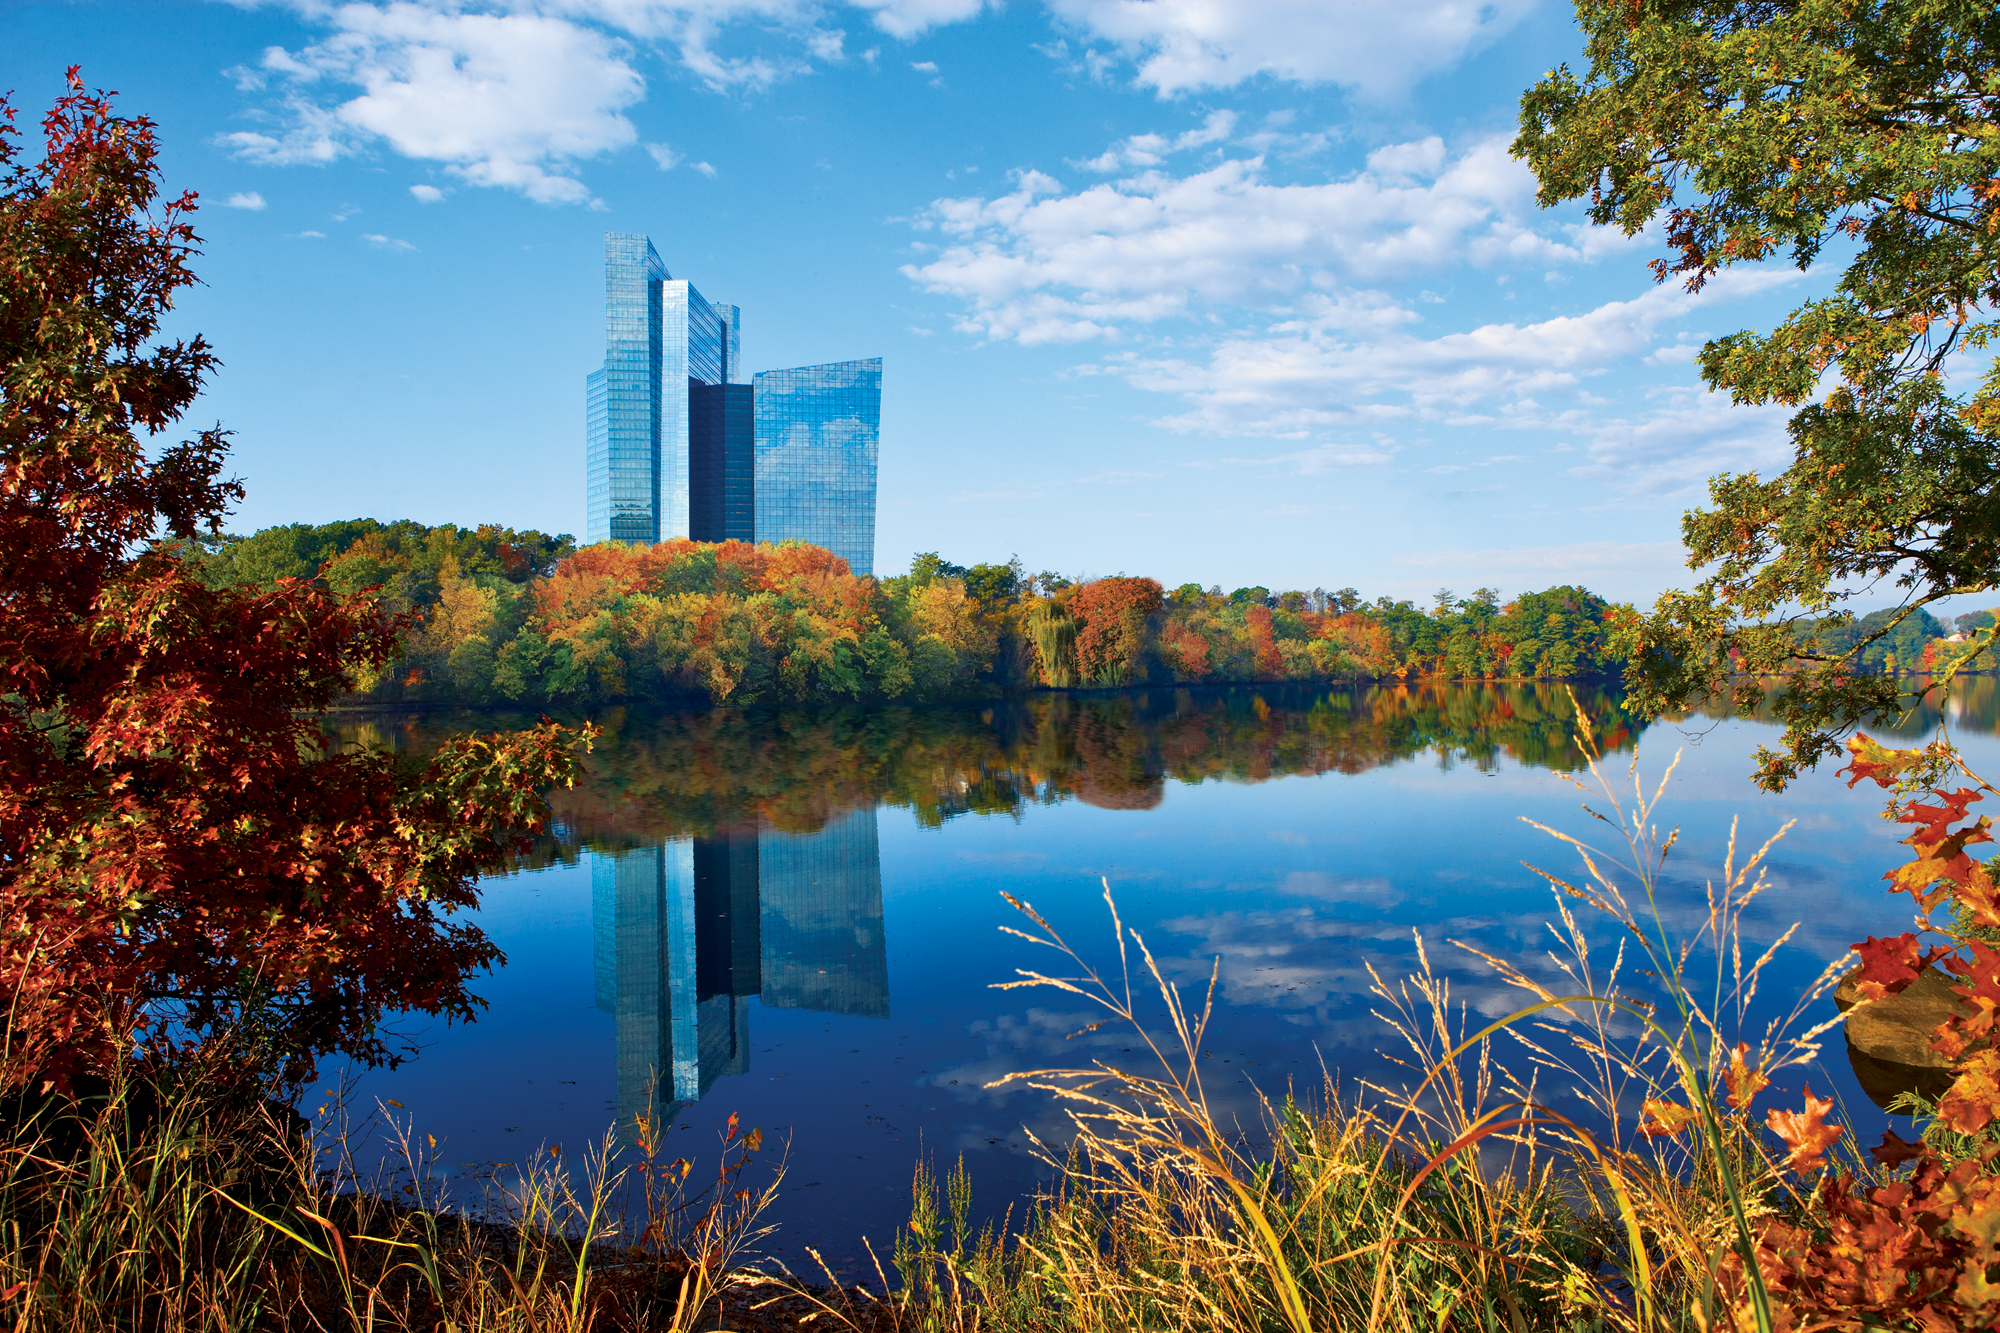 Korea Shines On Mohegan Sun For Third Incheon Casino Resort